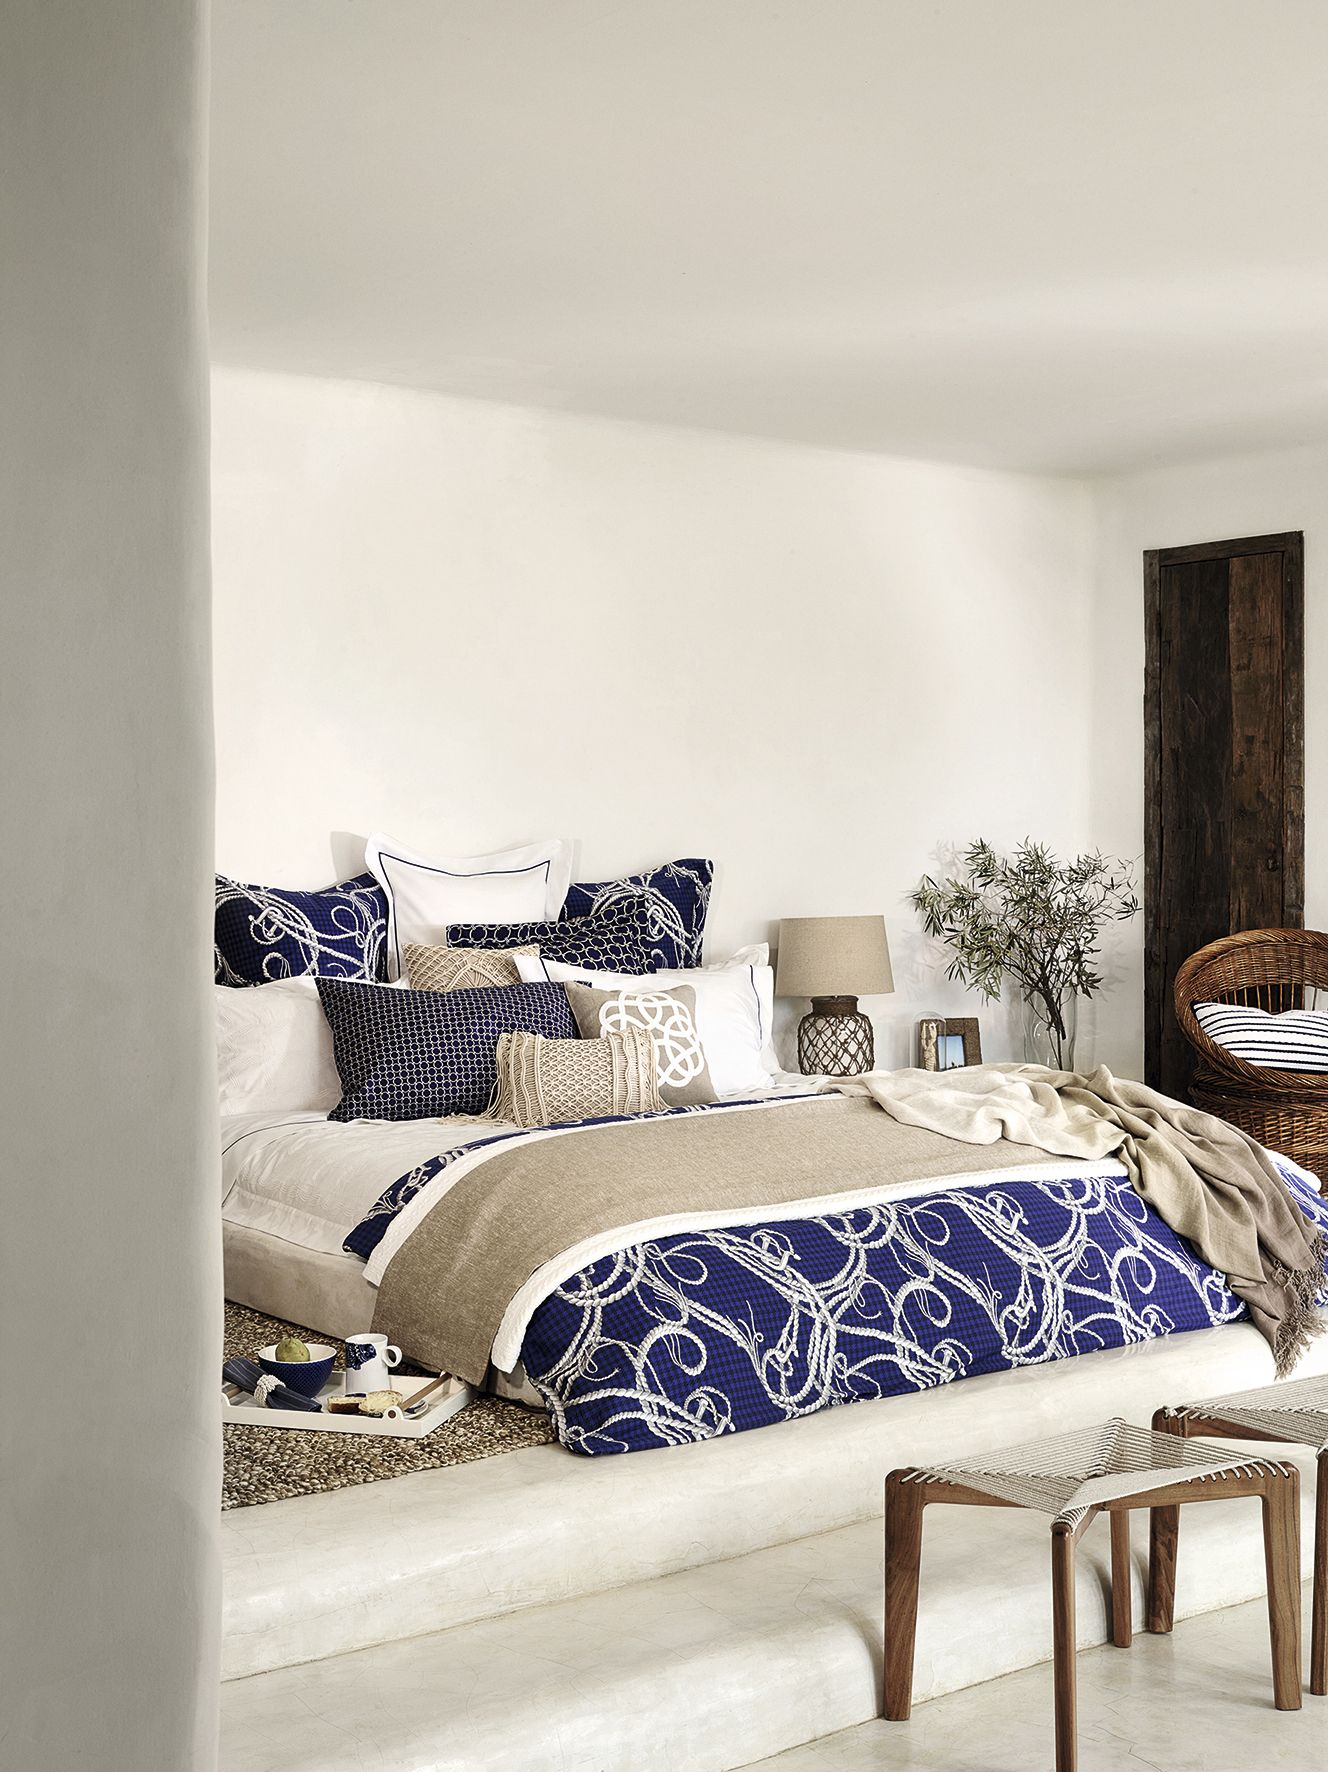 Zara Home Bedroom, Zara Home Interiors